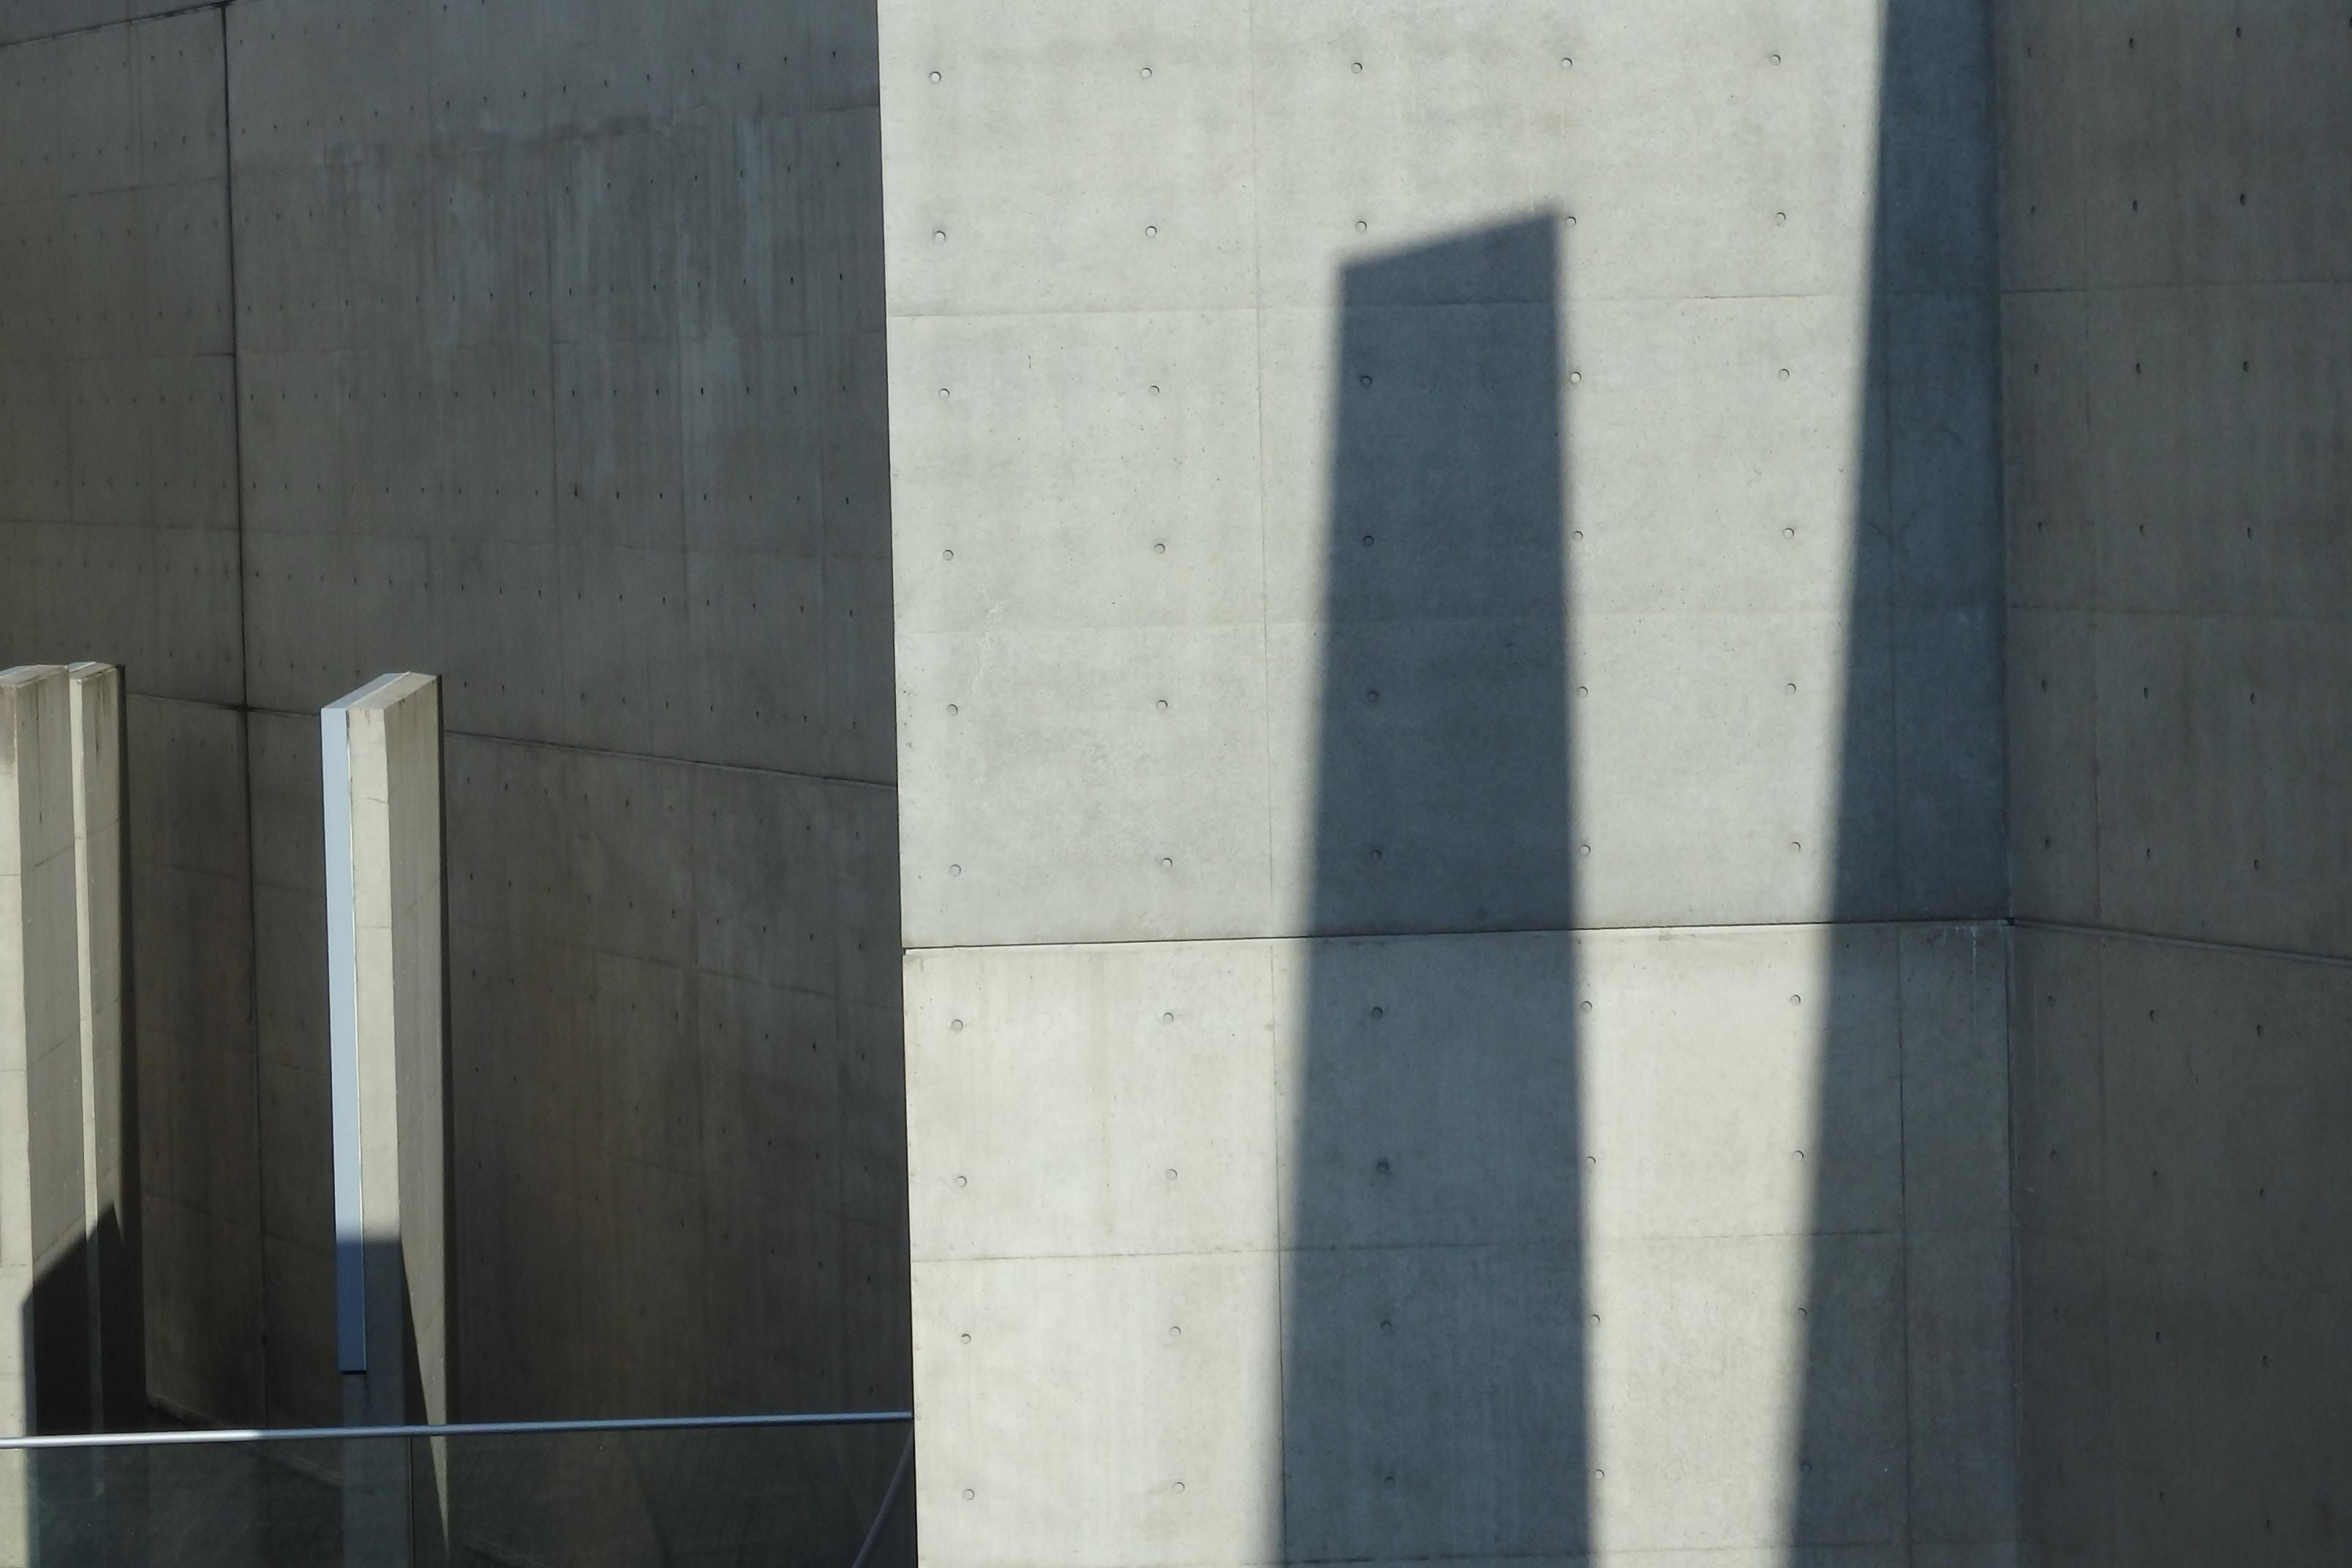 Long shadows on a concrete wall